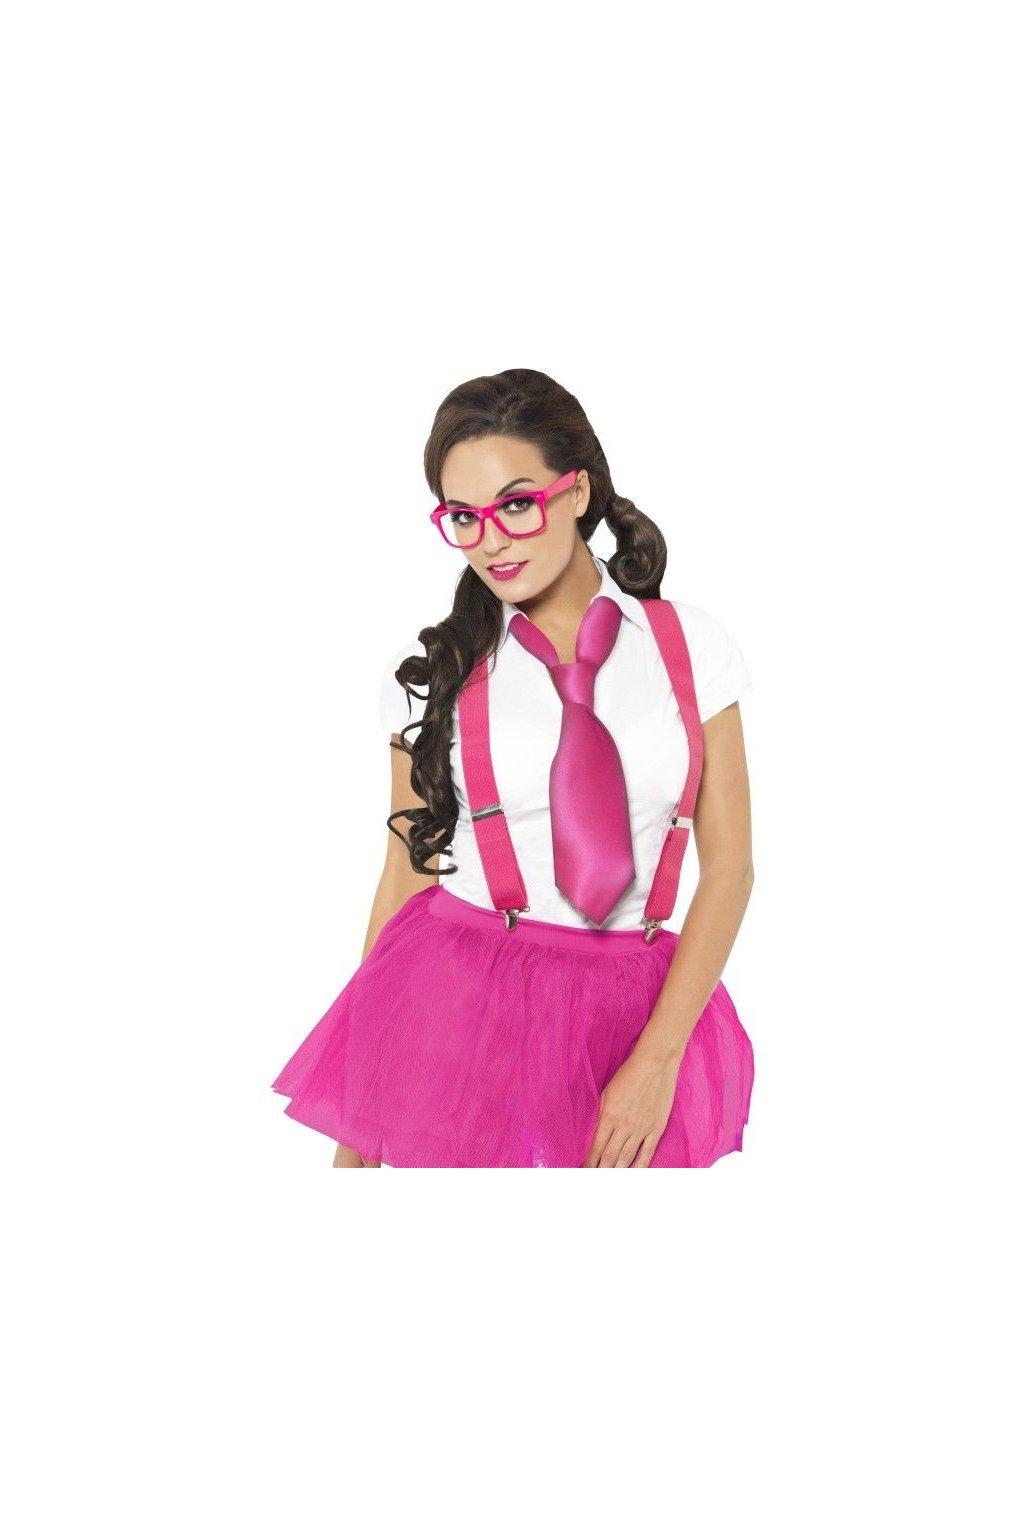 Školačka - růžová kravata, kšandy a brýle